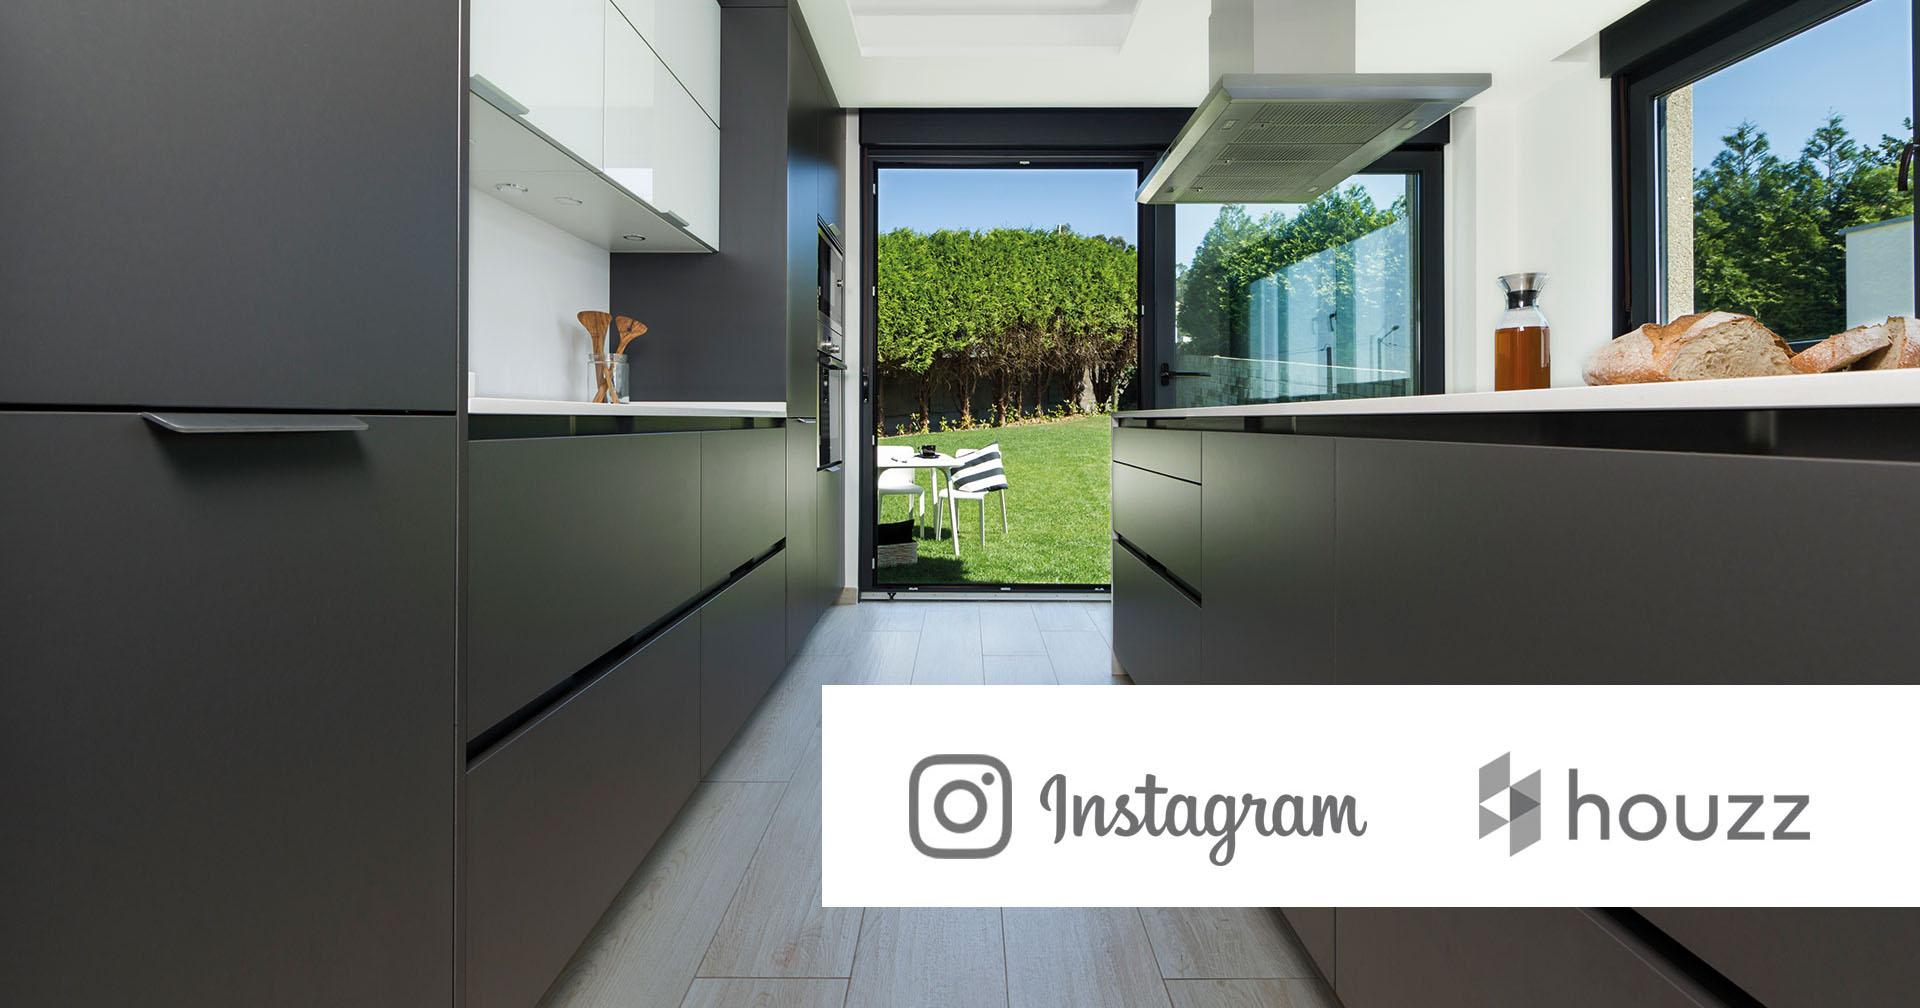 red social de decoraci n houzz e instagram nuevos canales